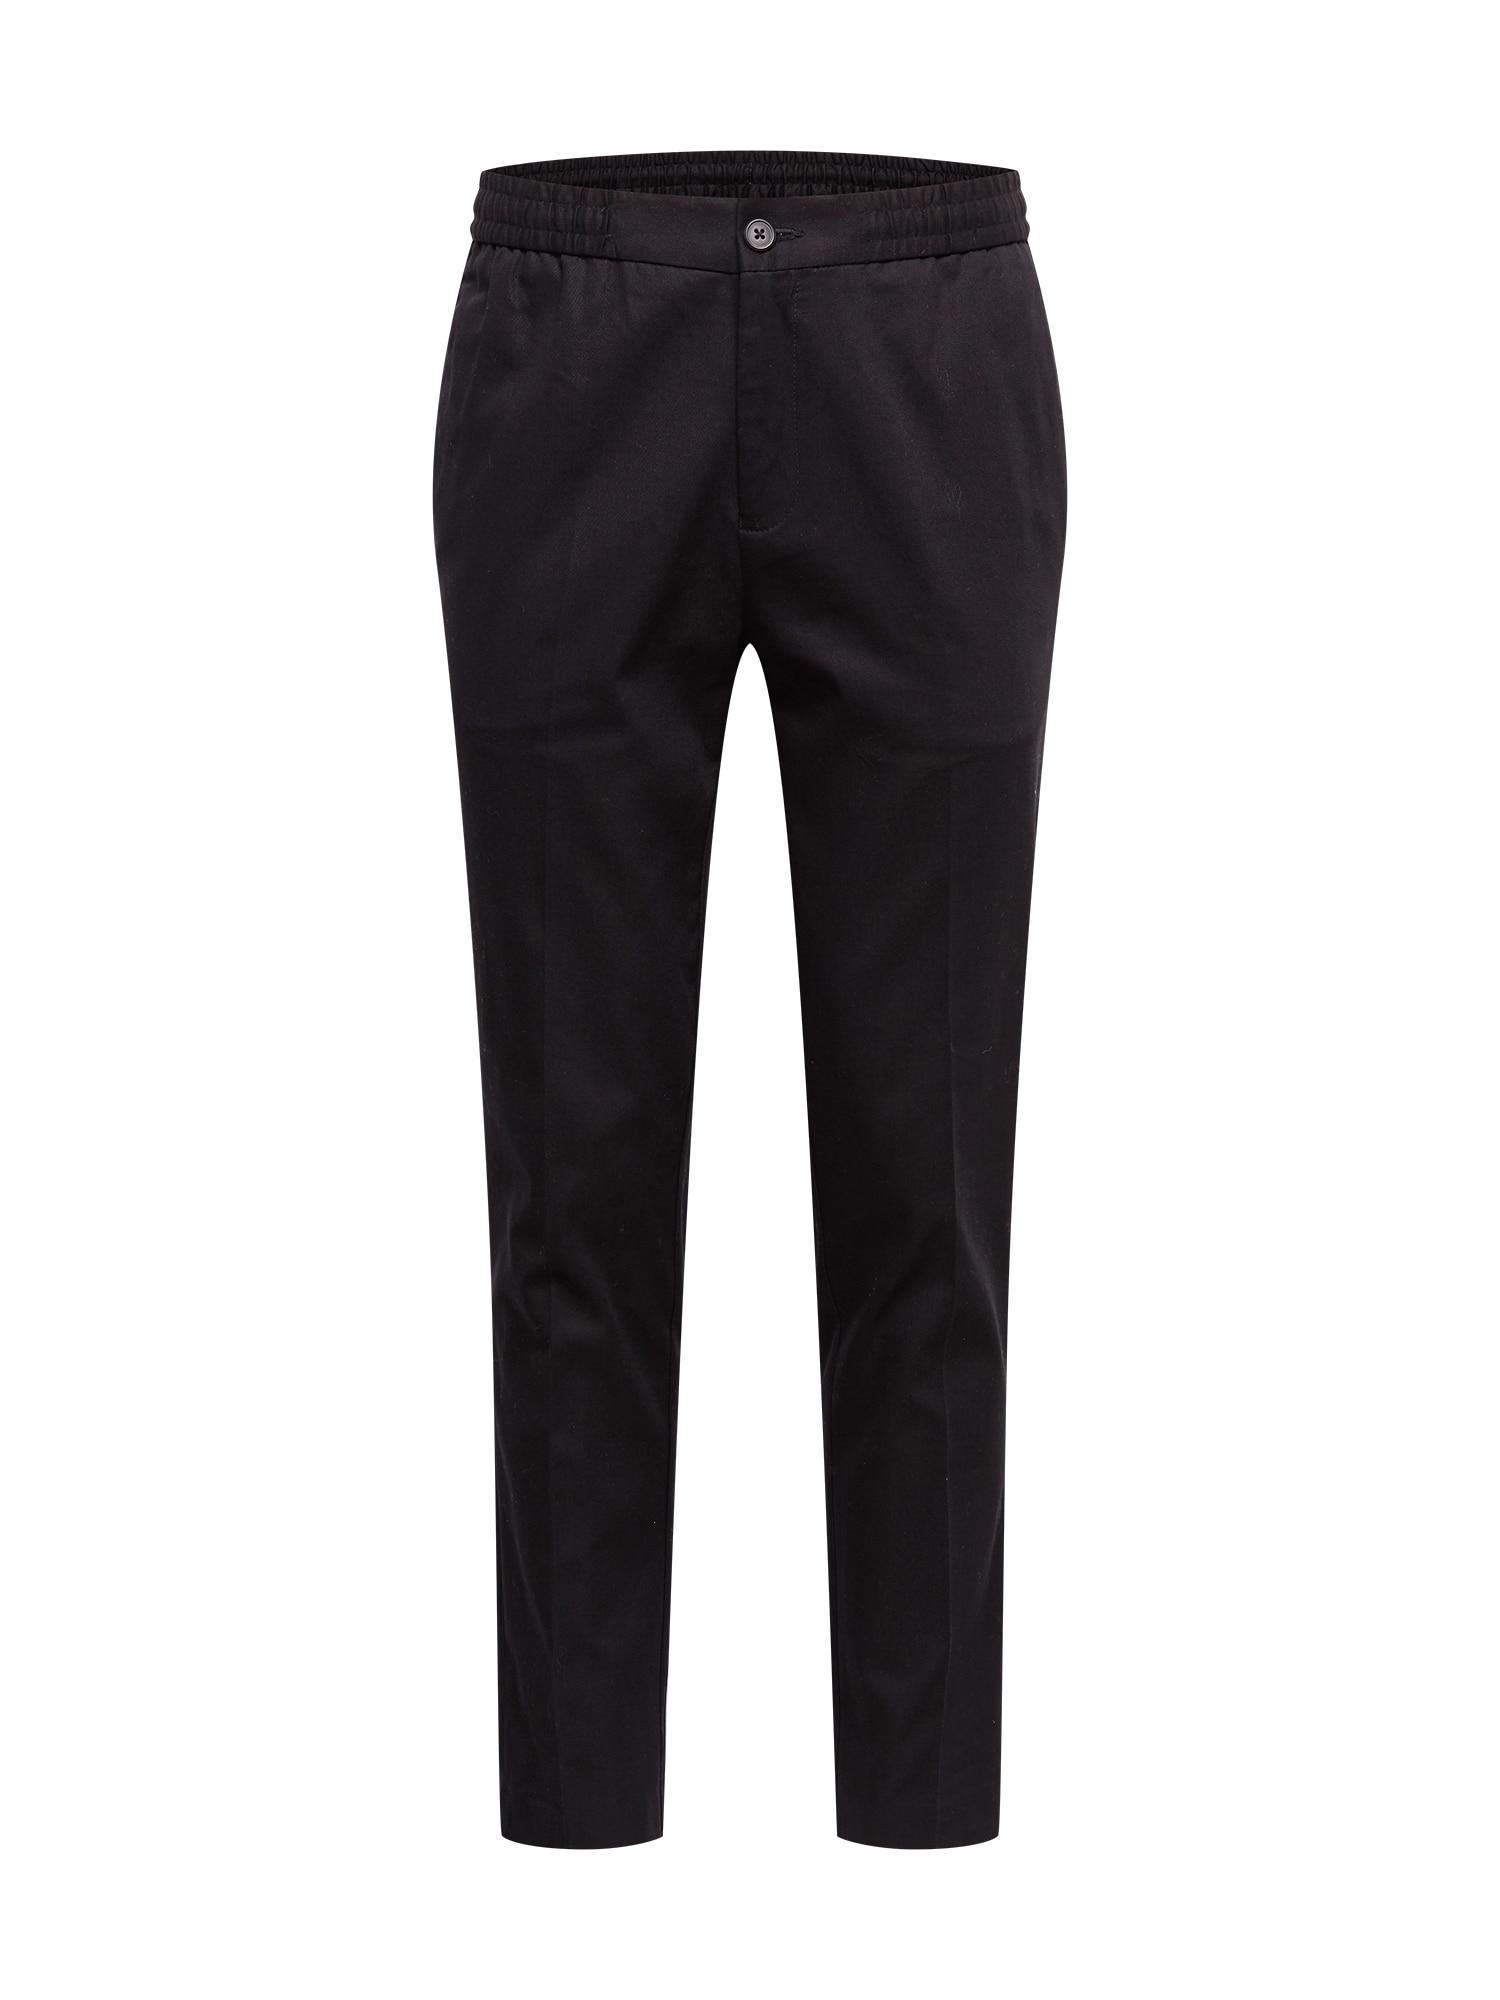 BURTON MENSWEAR LONDON Kelnės su kantu juoda